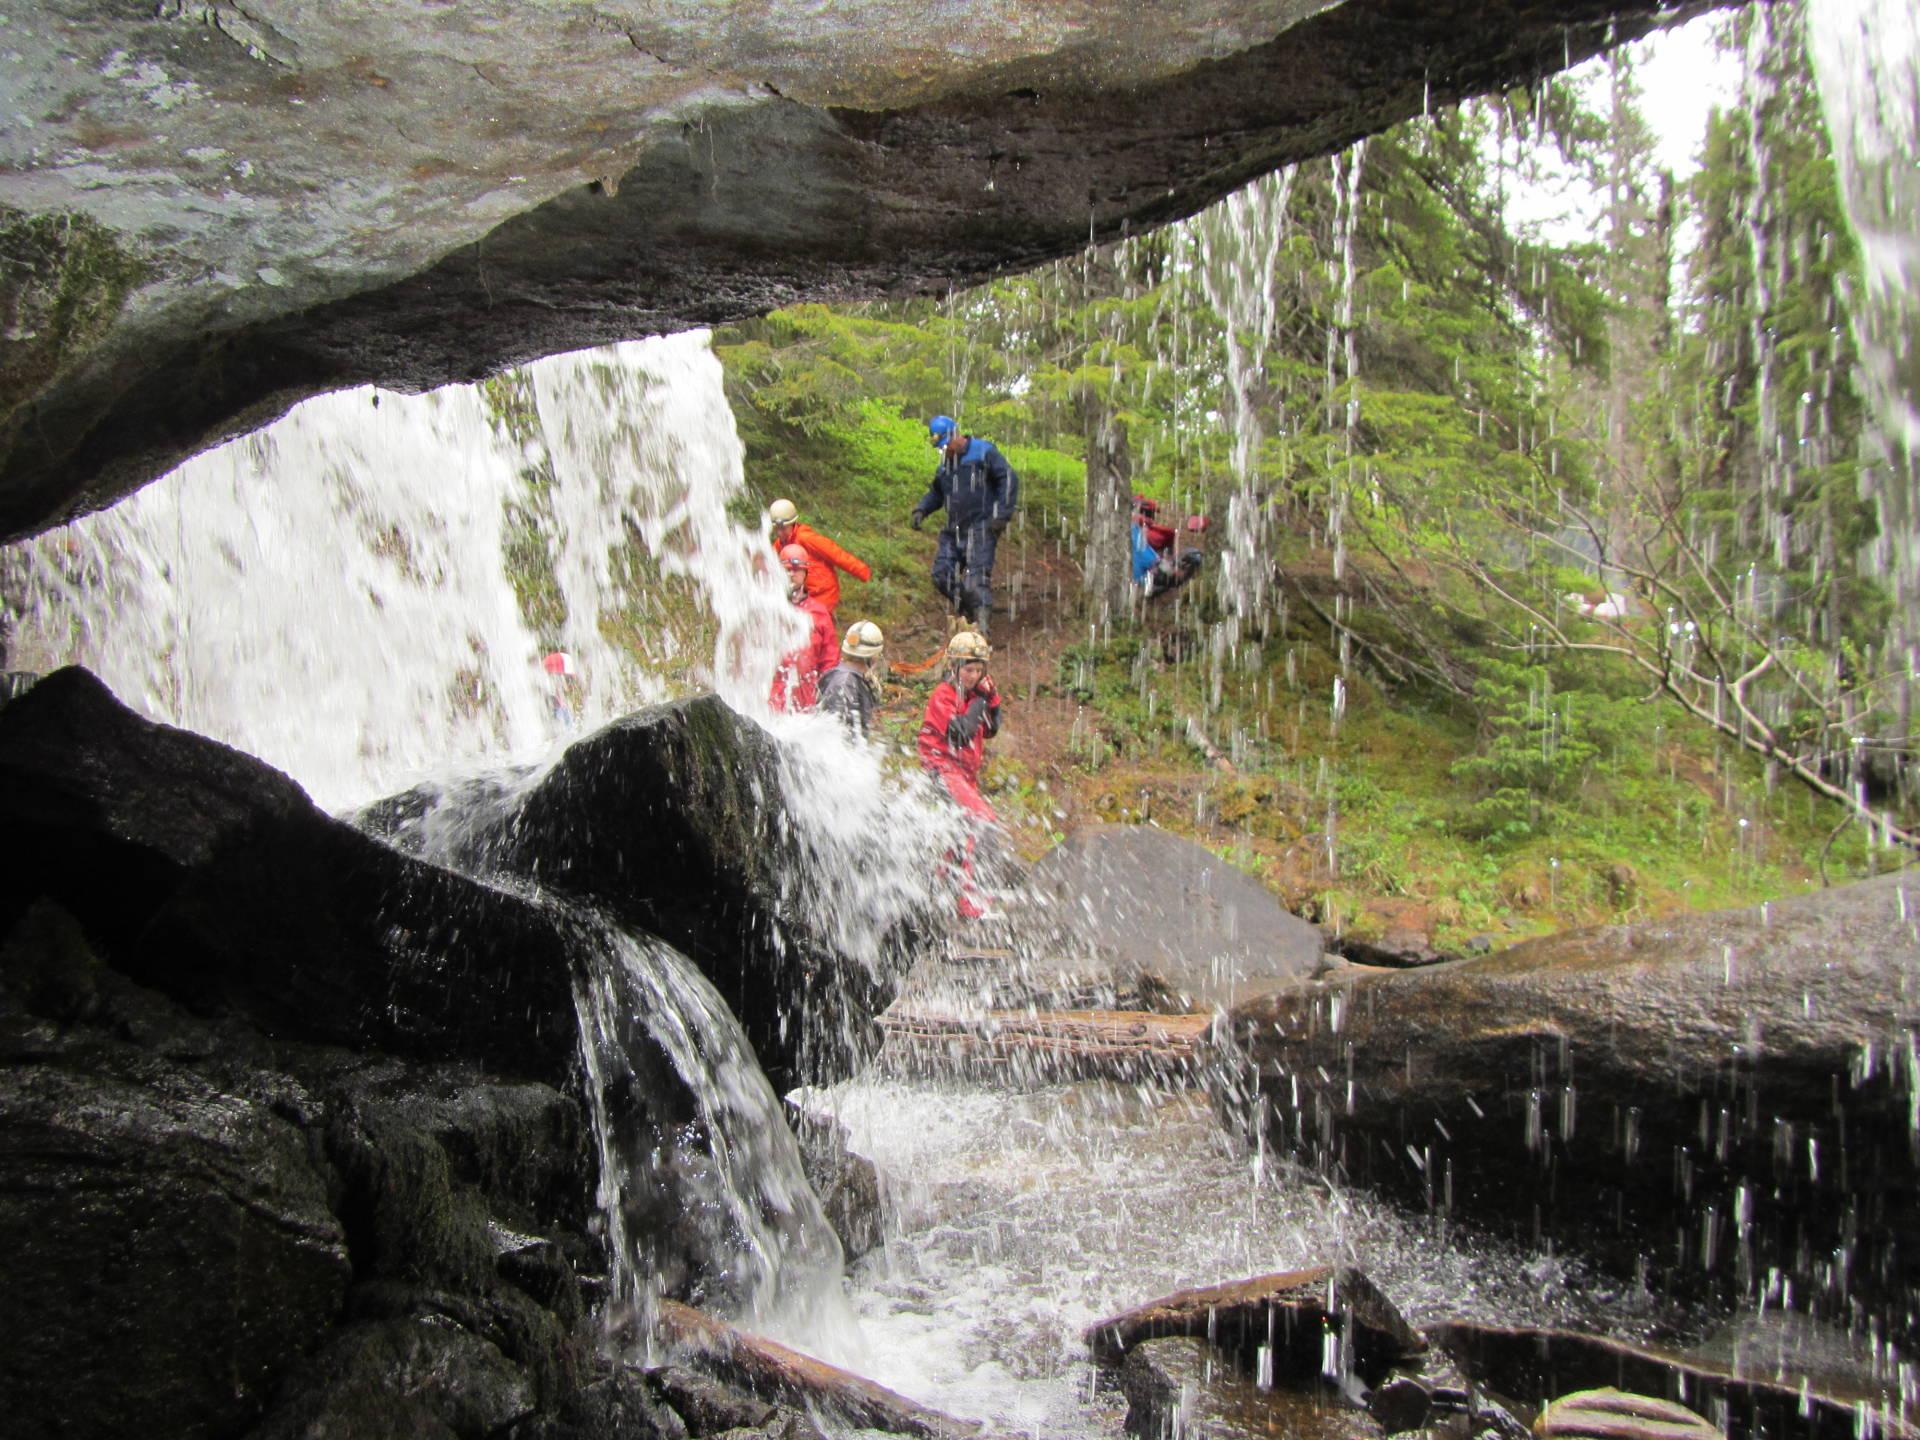 Cave trip to Bergsjögrottan